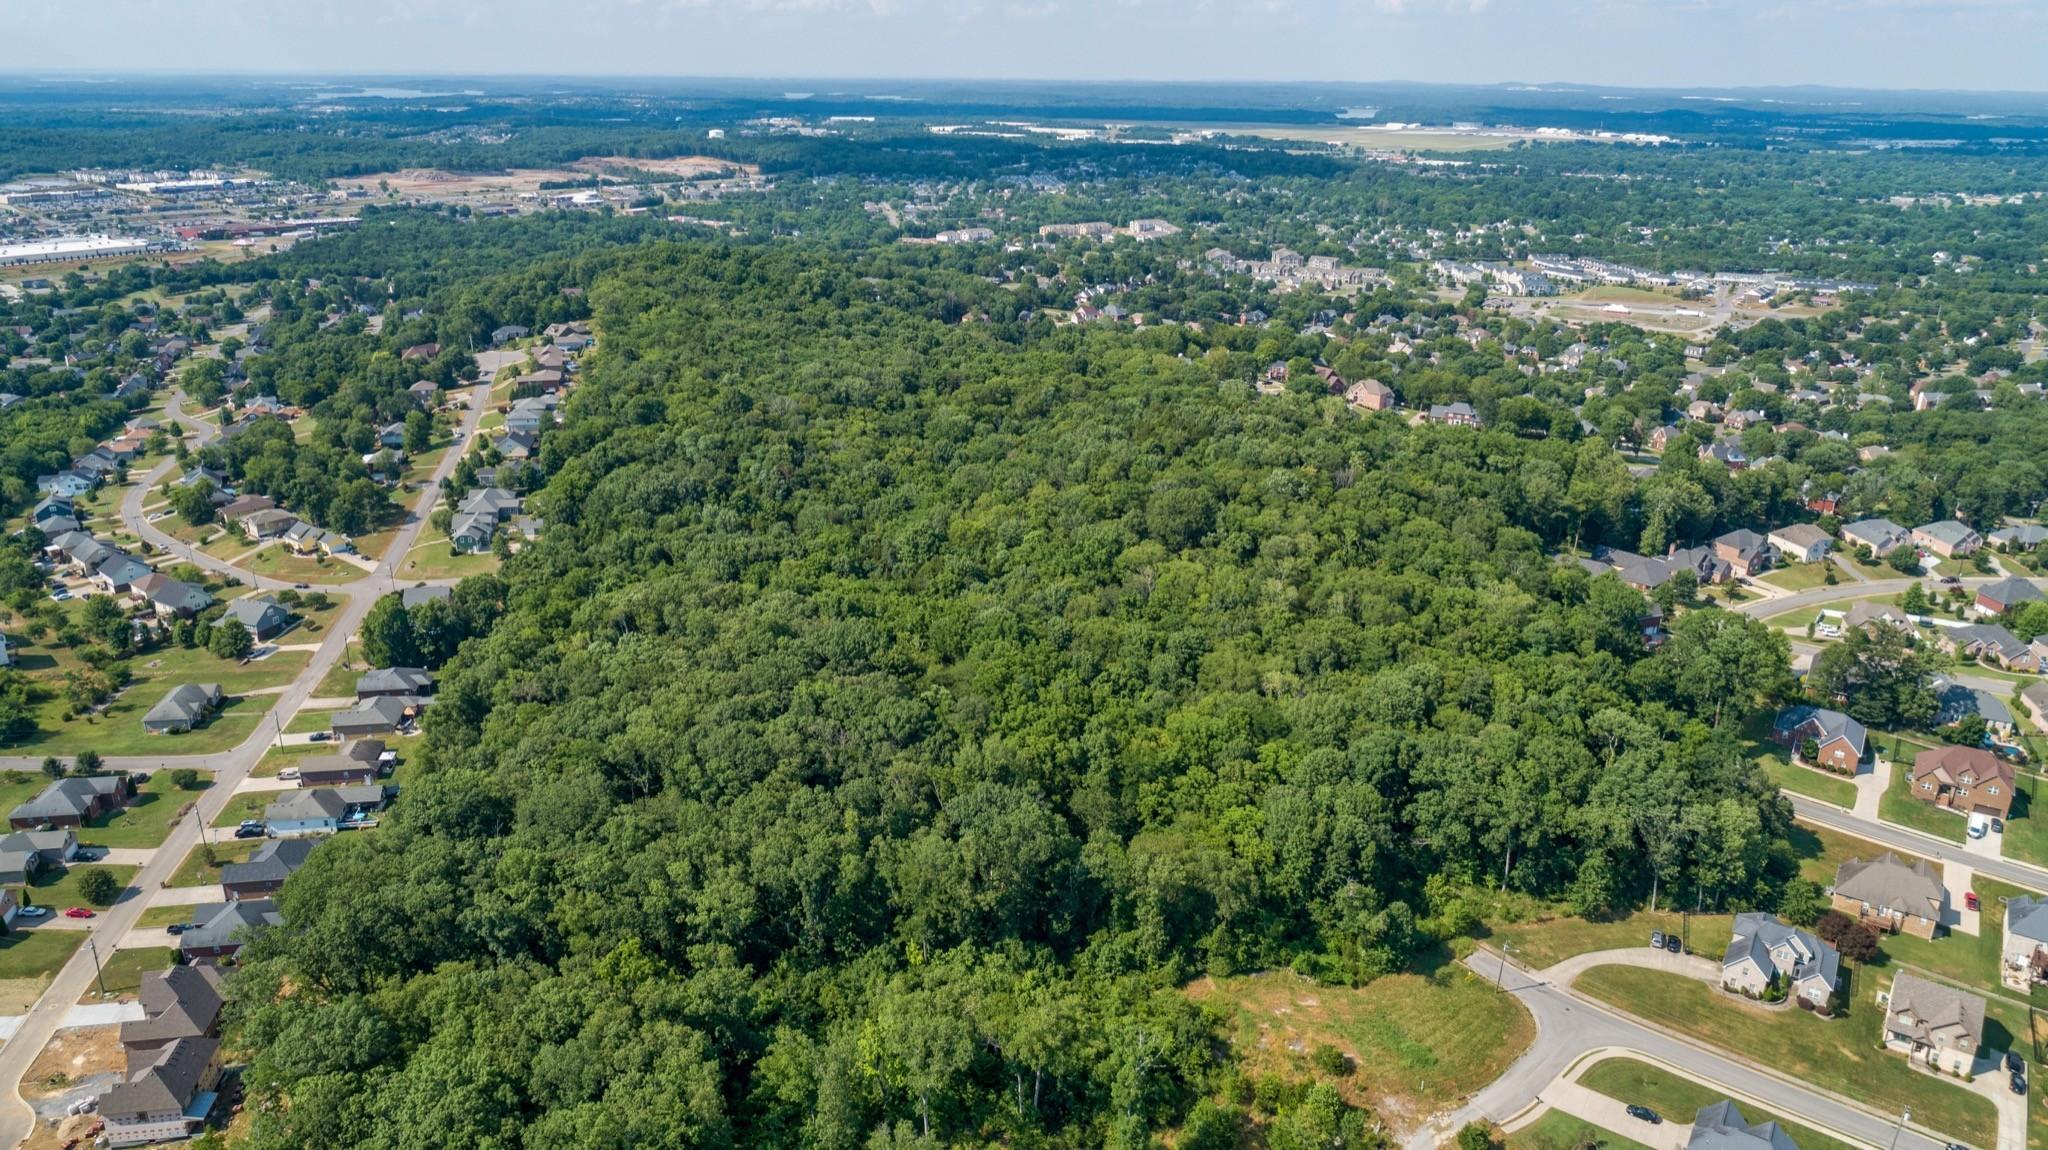 103 Williamsport Dr Property Photo - Smyrna, TN real estate listing